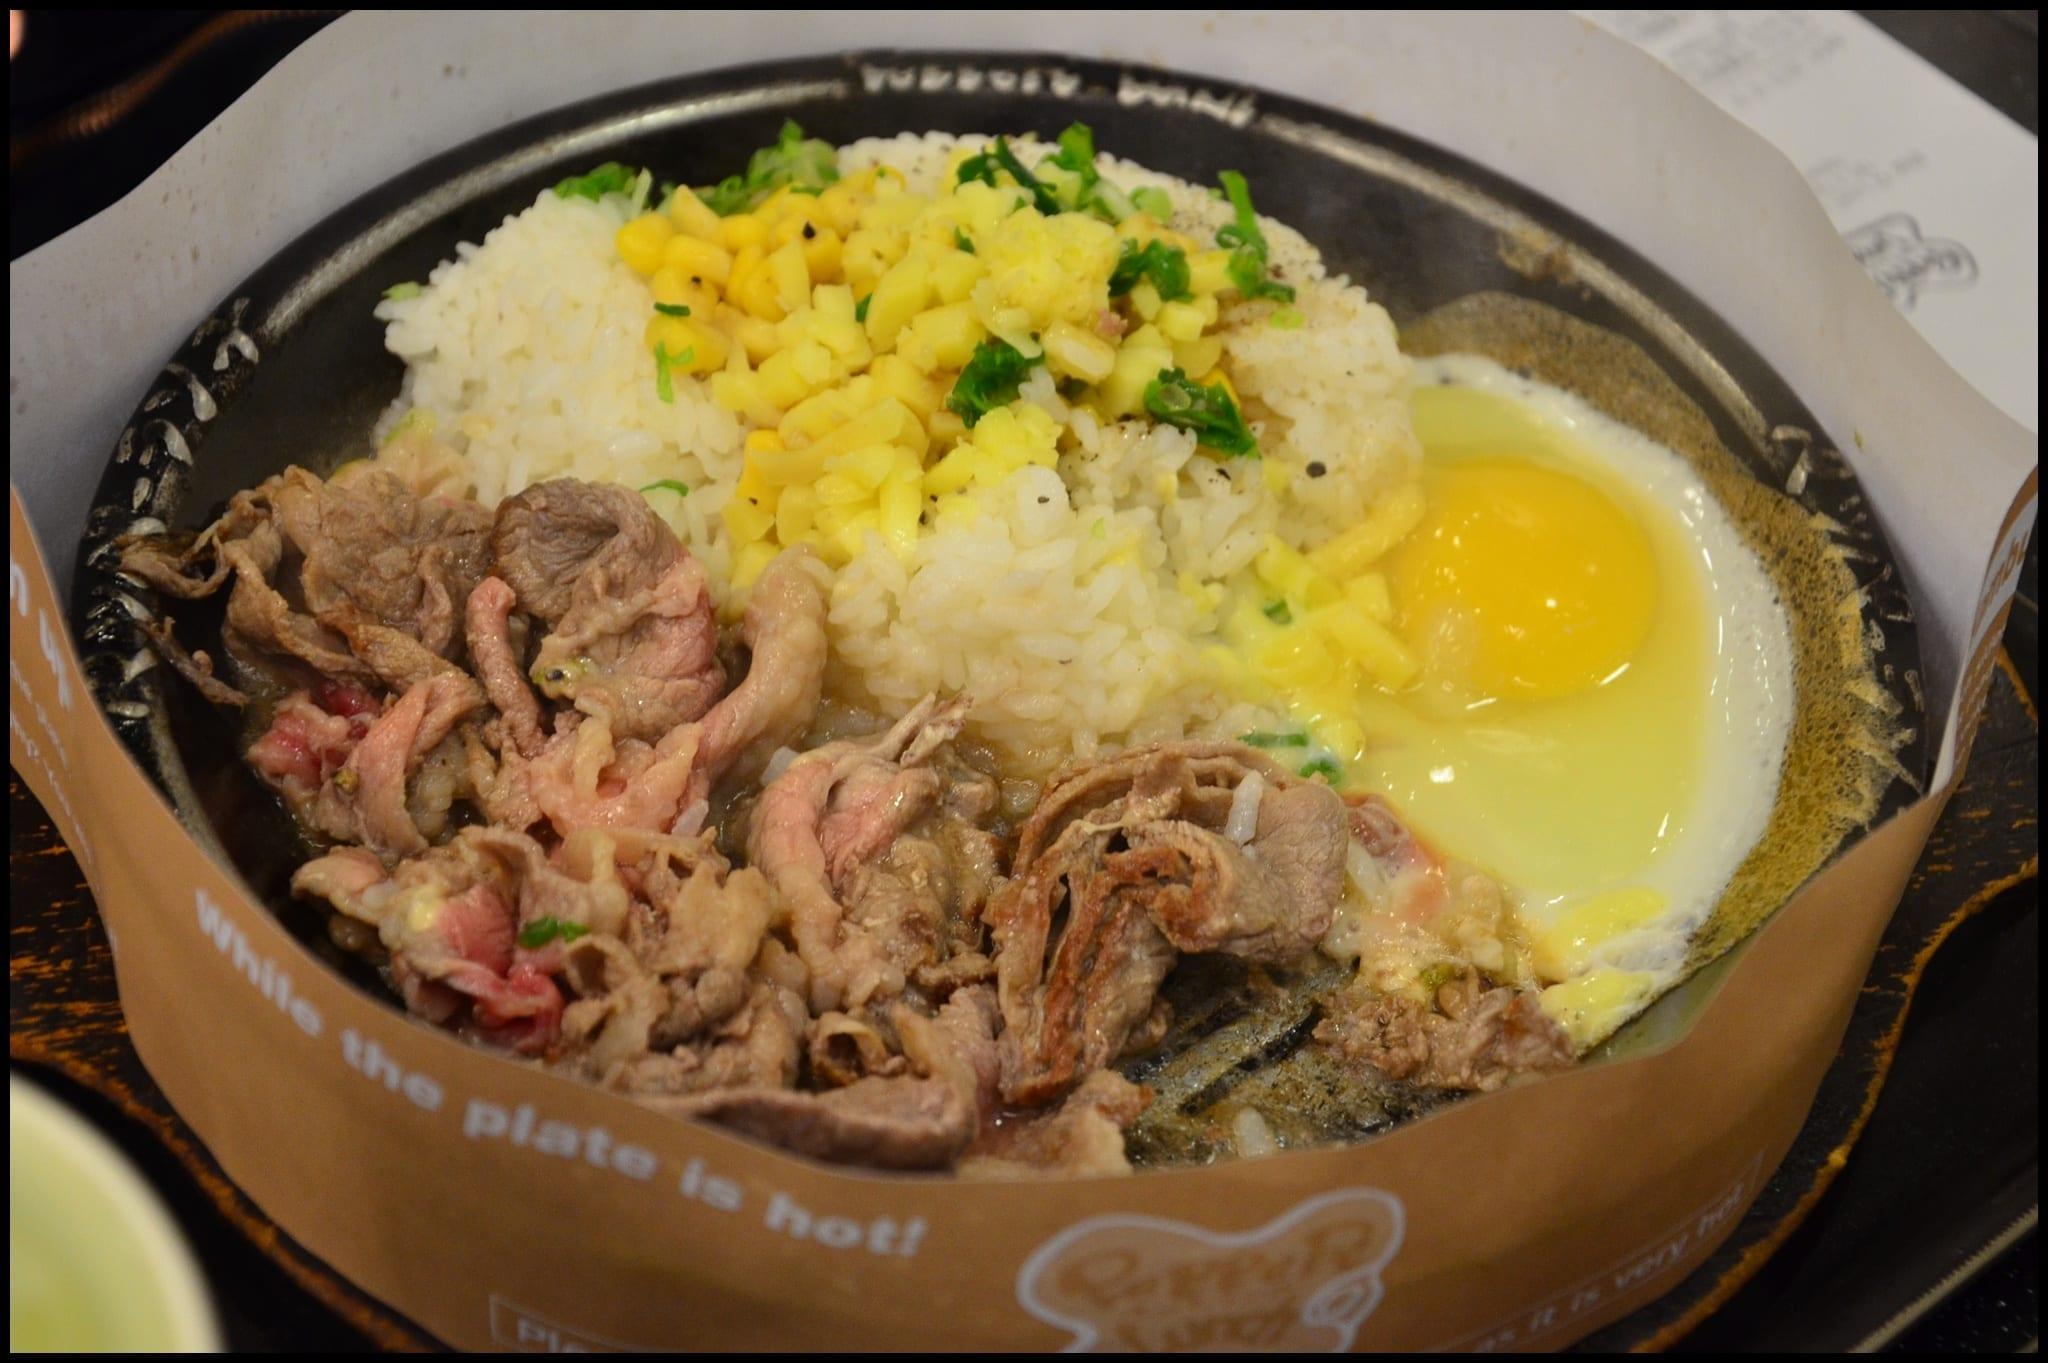 hong kong hot plate] mongkok mall food.jpg